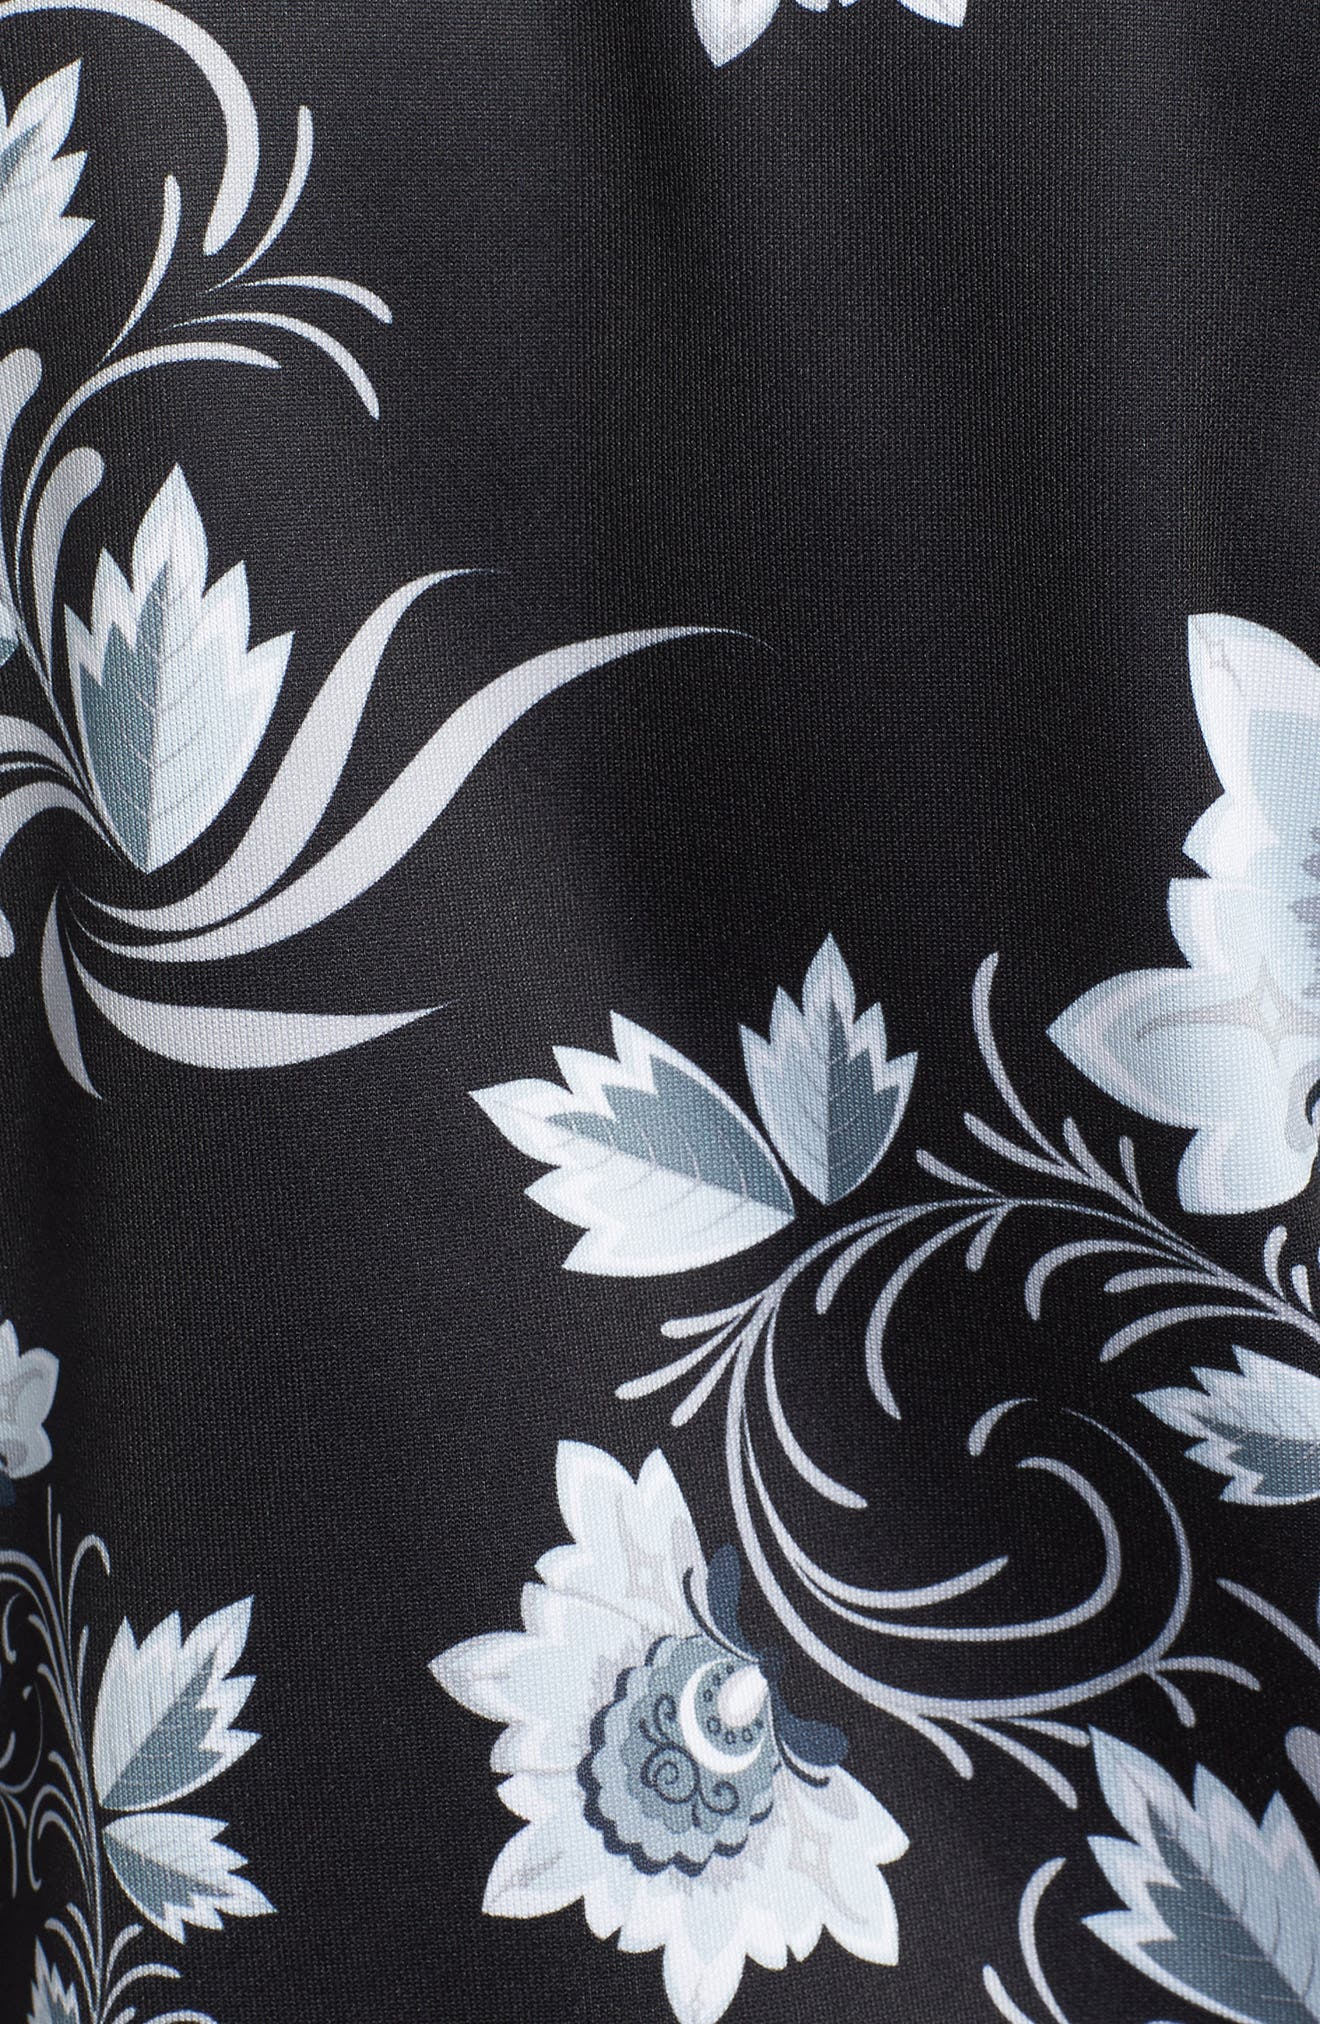 NSW Tribute Jacket,                             Alternate thumbnail 5, color,                             White/ Black/ White